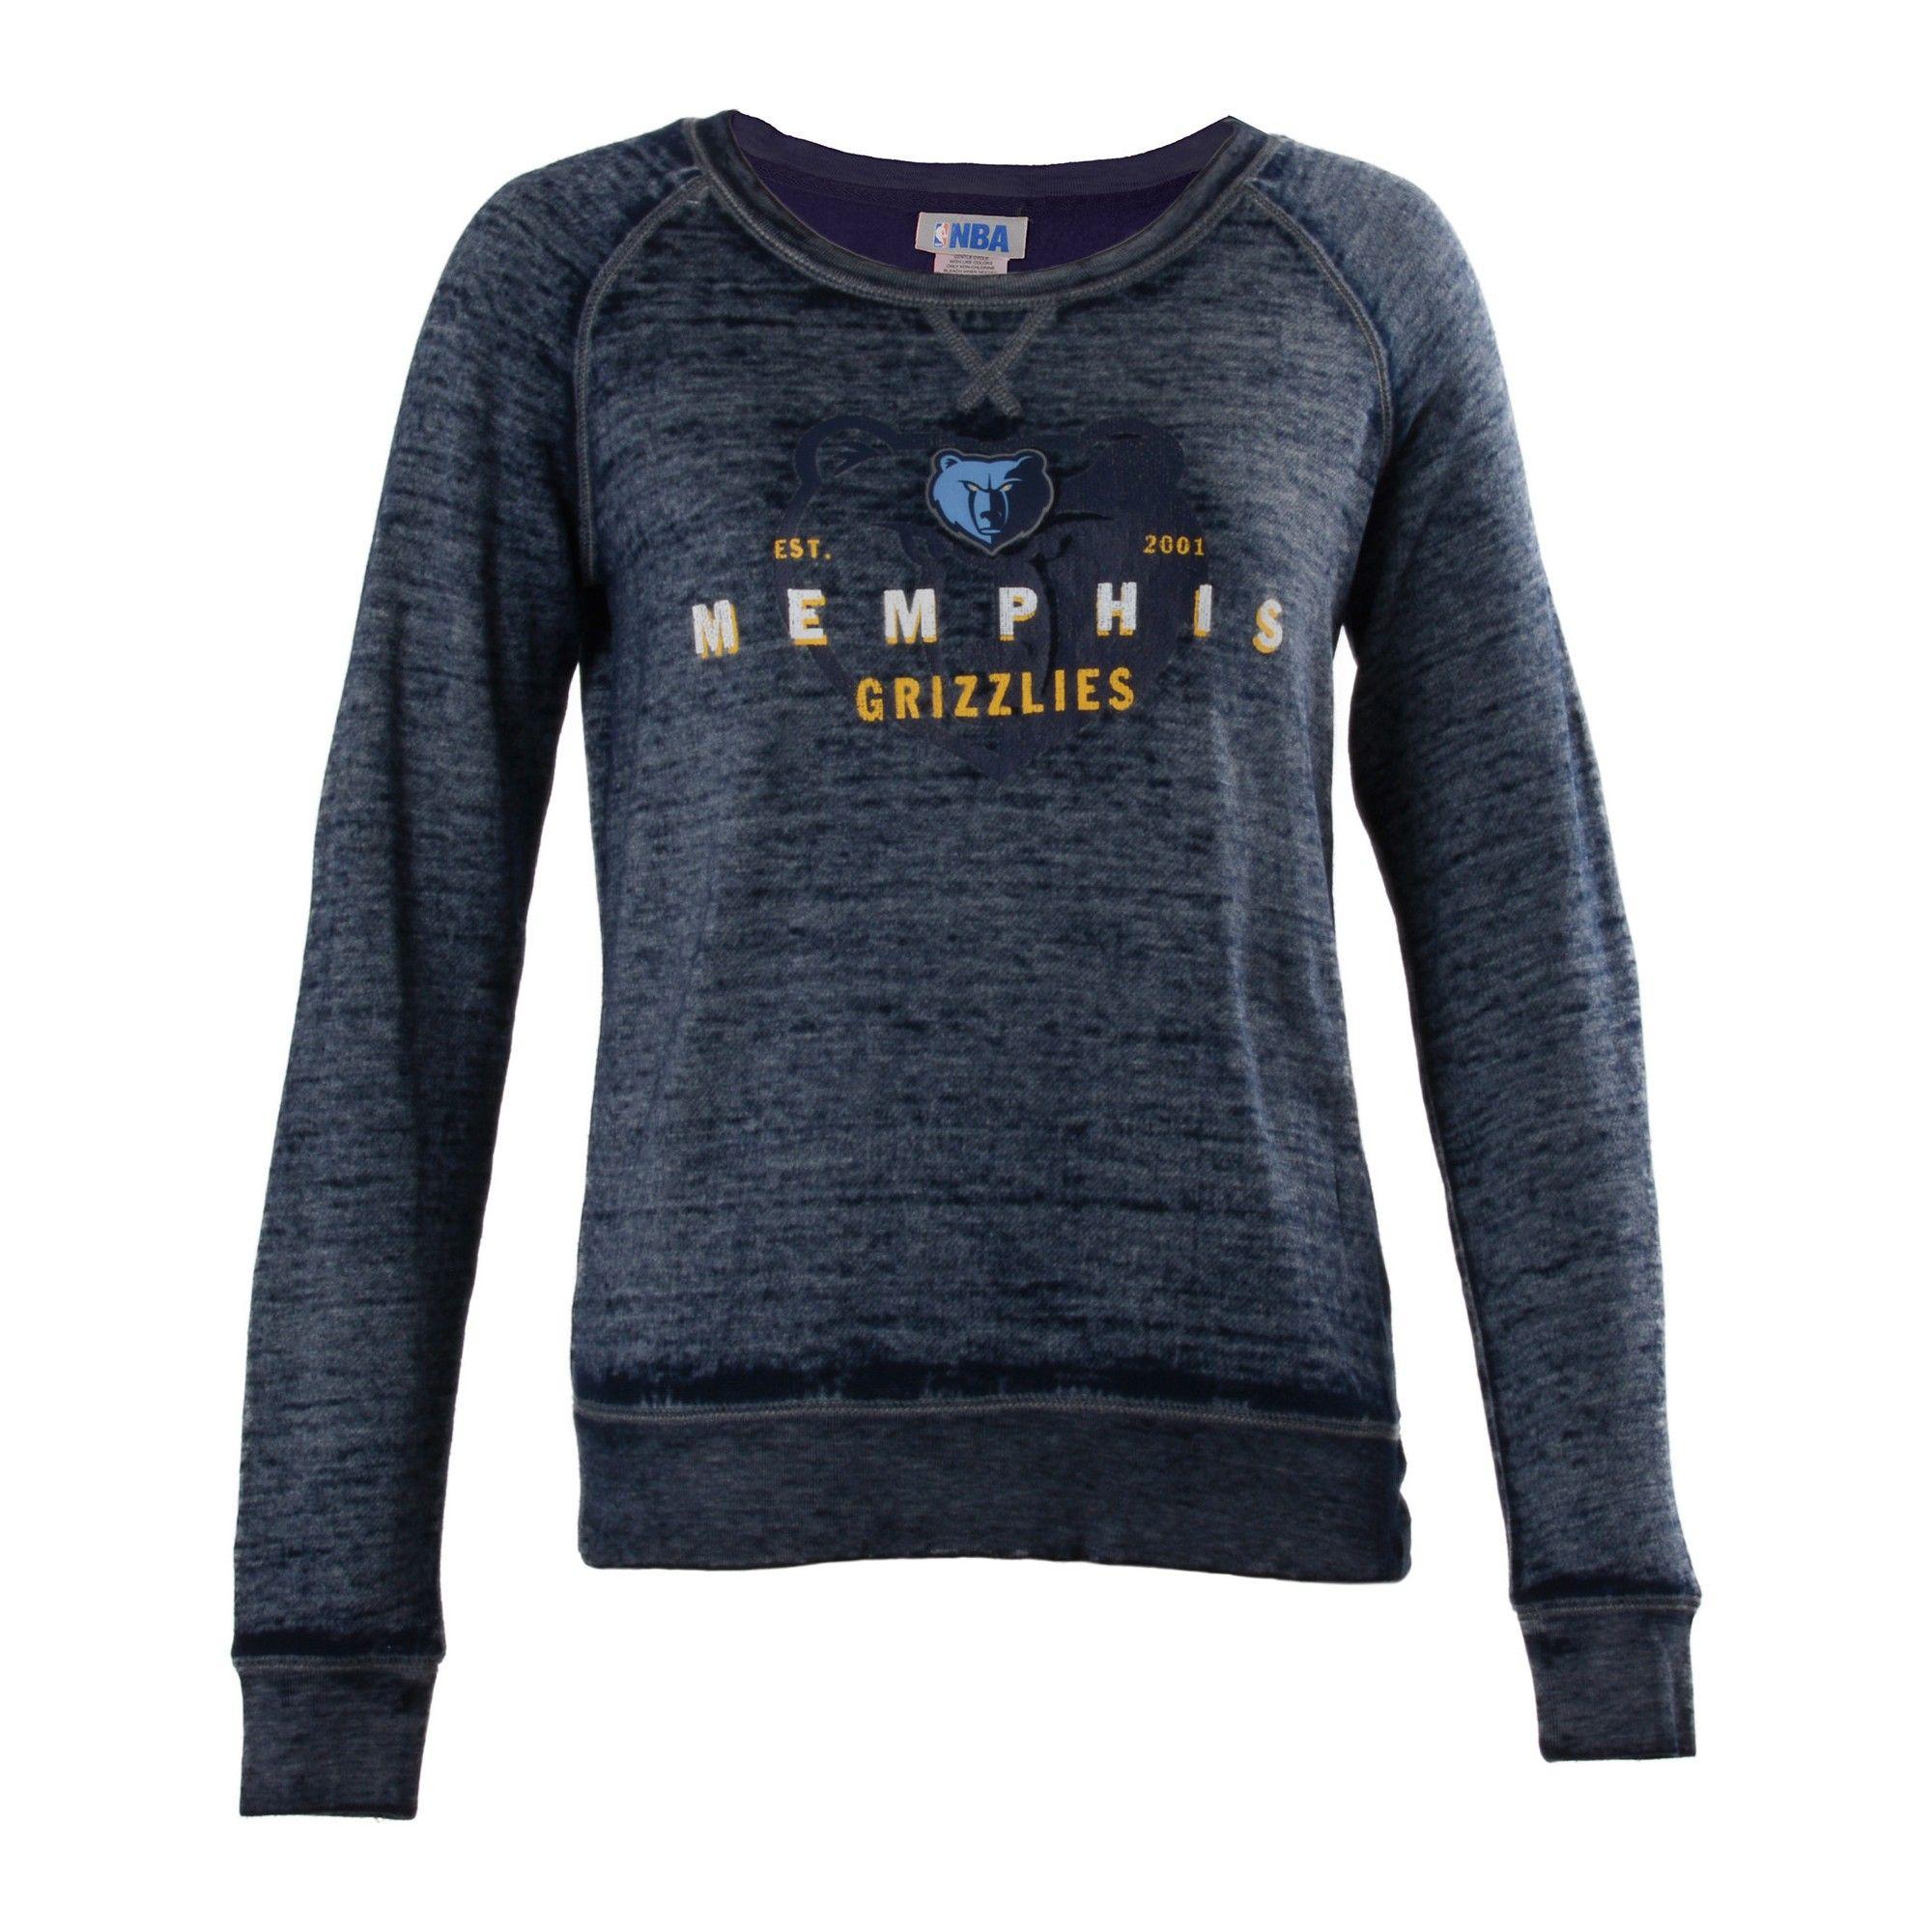 d0eca60c5 Memphis Grizzlies Women s Retro Logo Burnout Crew Neck Sweatshirt ...